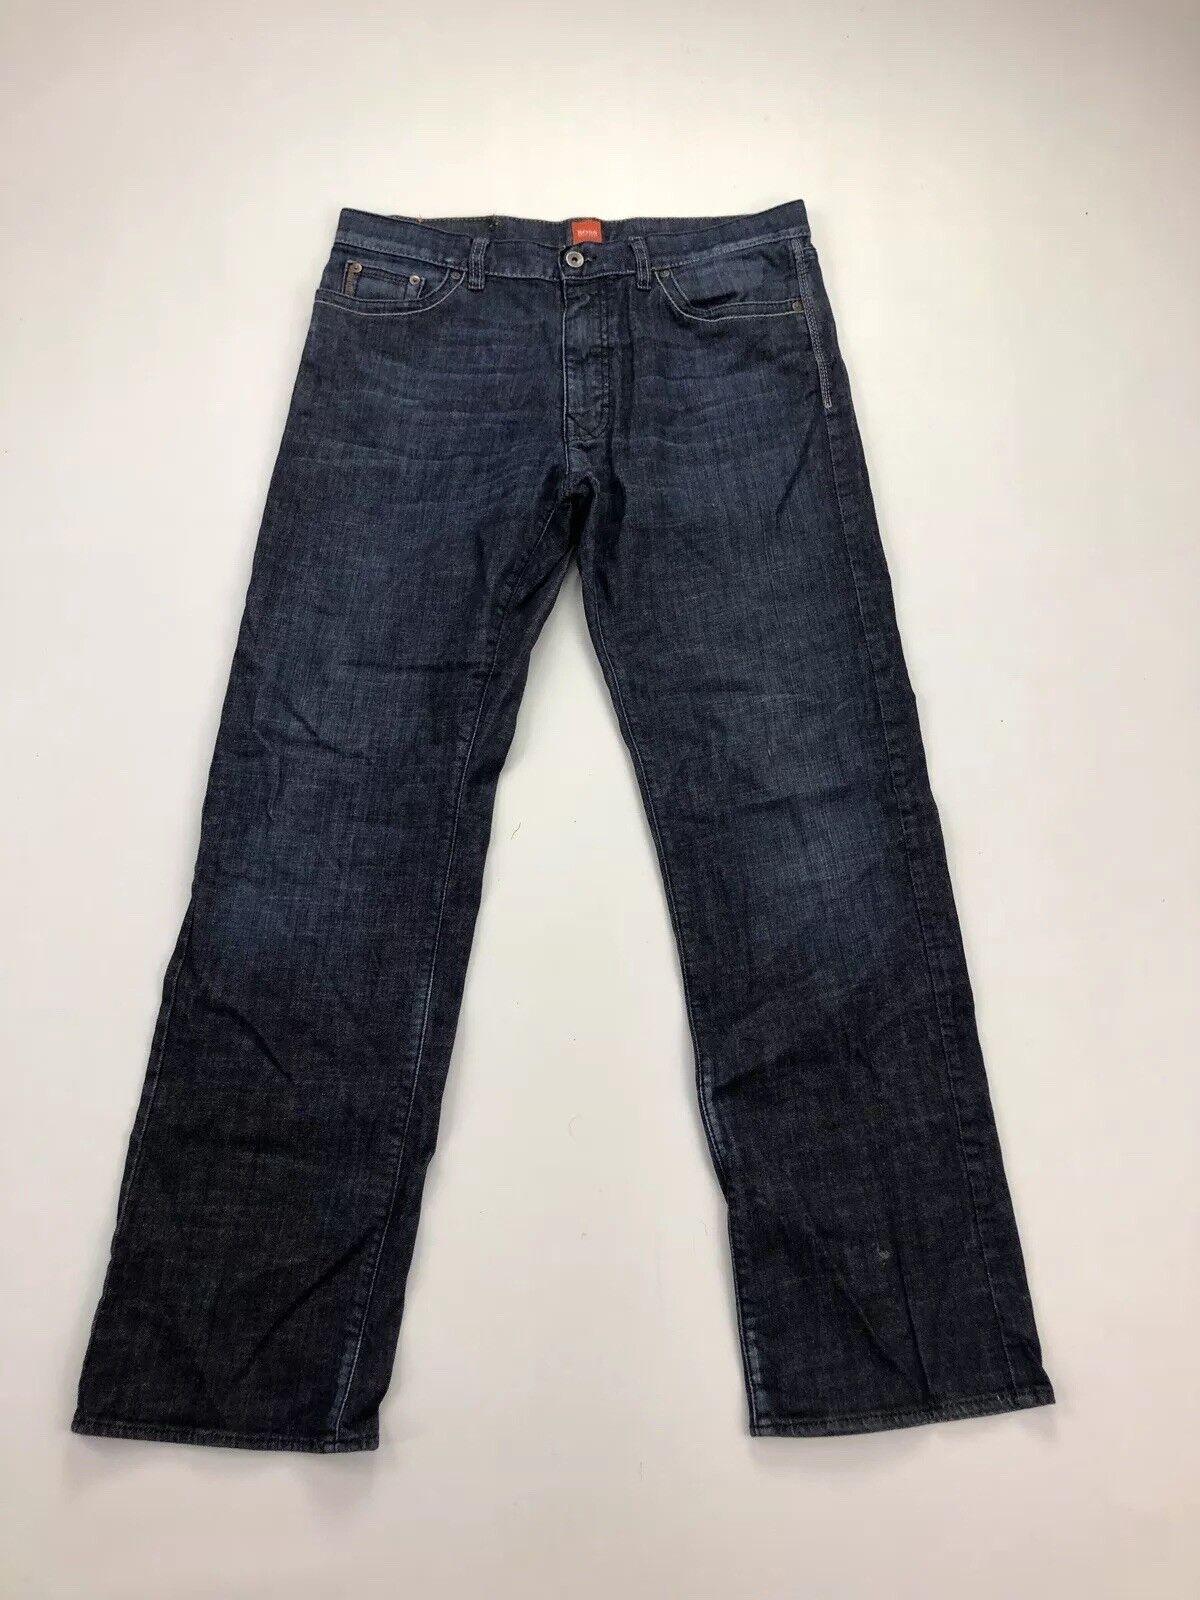 HUGO BOSS Jeans - W36 L34 - Navy - Great Condition - Men's    Online-Exportgeschäft    Deutsche Outlets    Stil